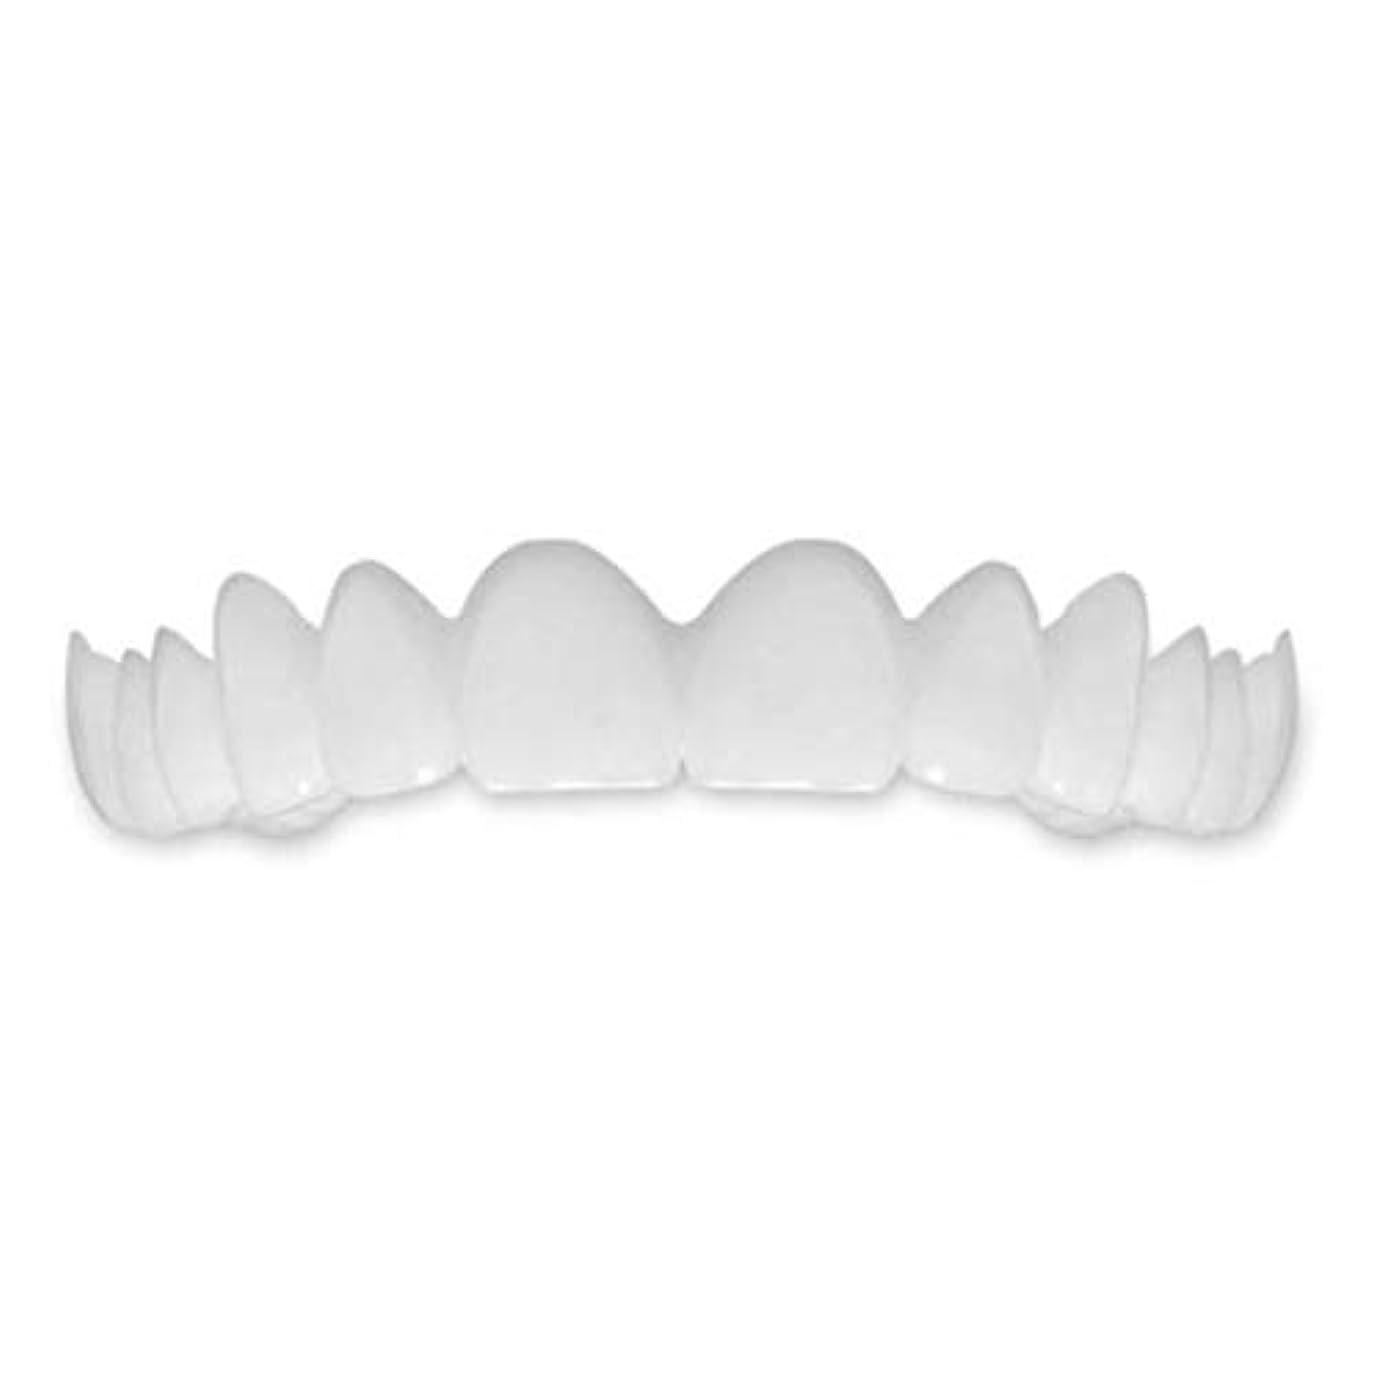 Kongqiabona実用的なデザインのメンズ女性の歯インスタントパーフェクトスマイルコンフォートフィットフレックス歯は、笑顔の偽の歯のホワイトニングに合う